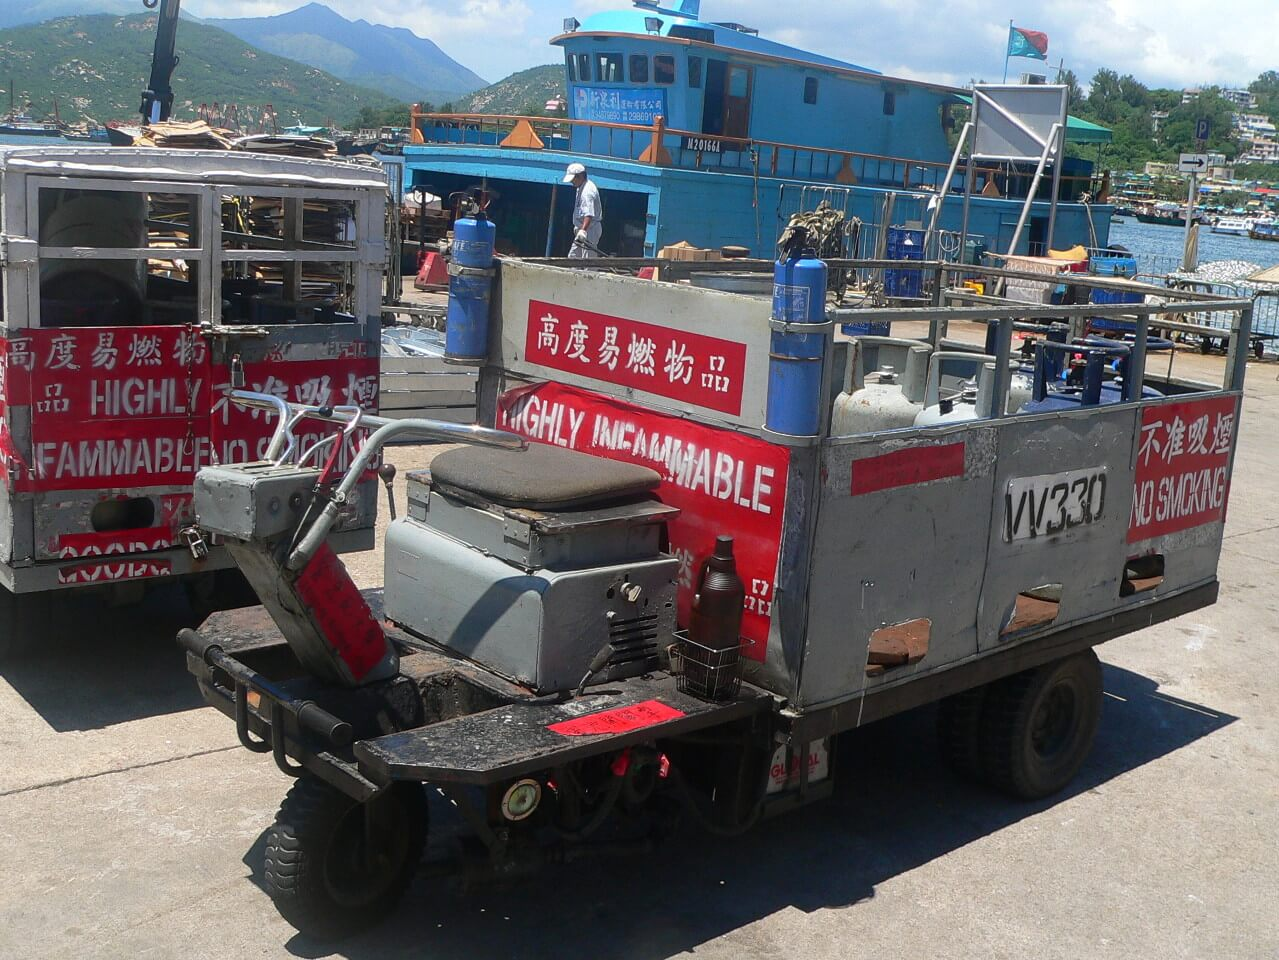 Village Vehicles Cheung Chau Hanson's Hikes